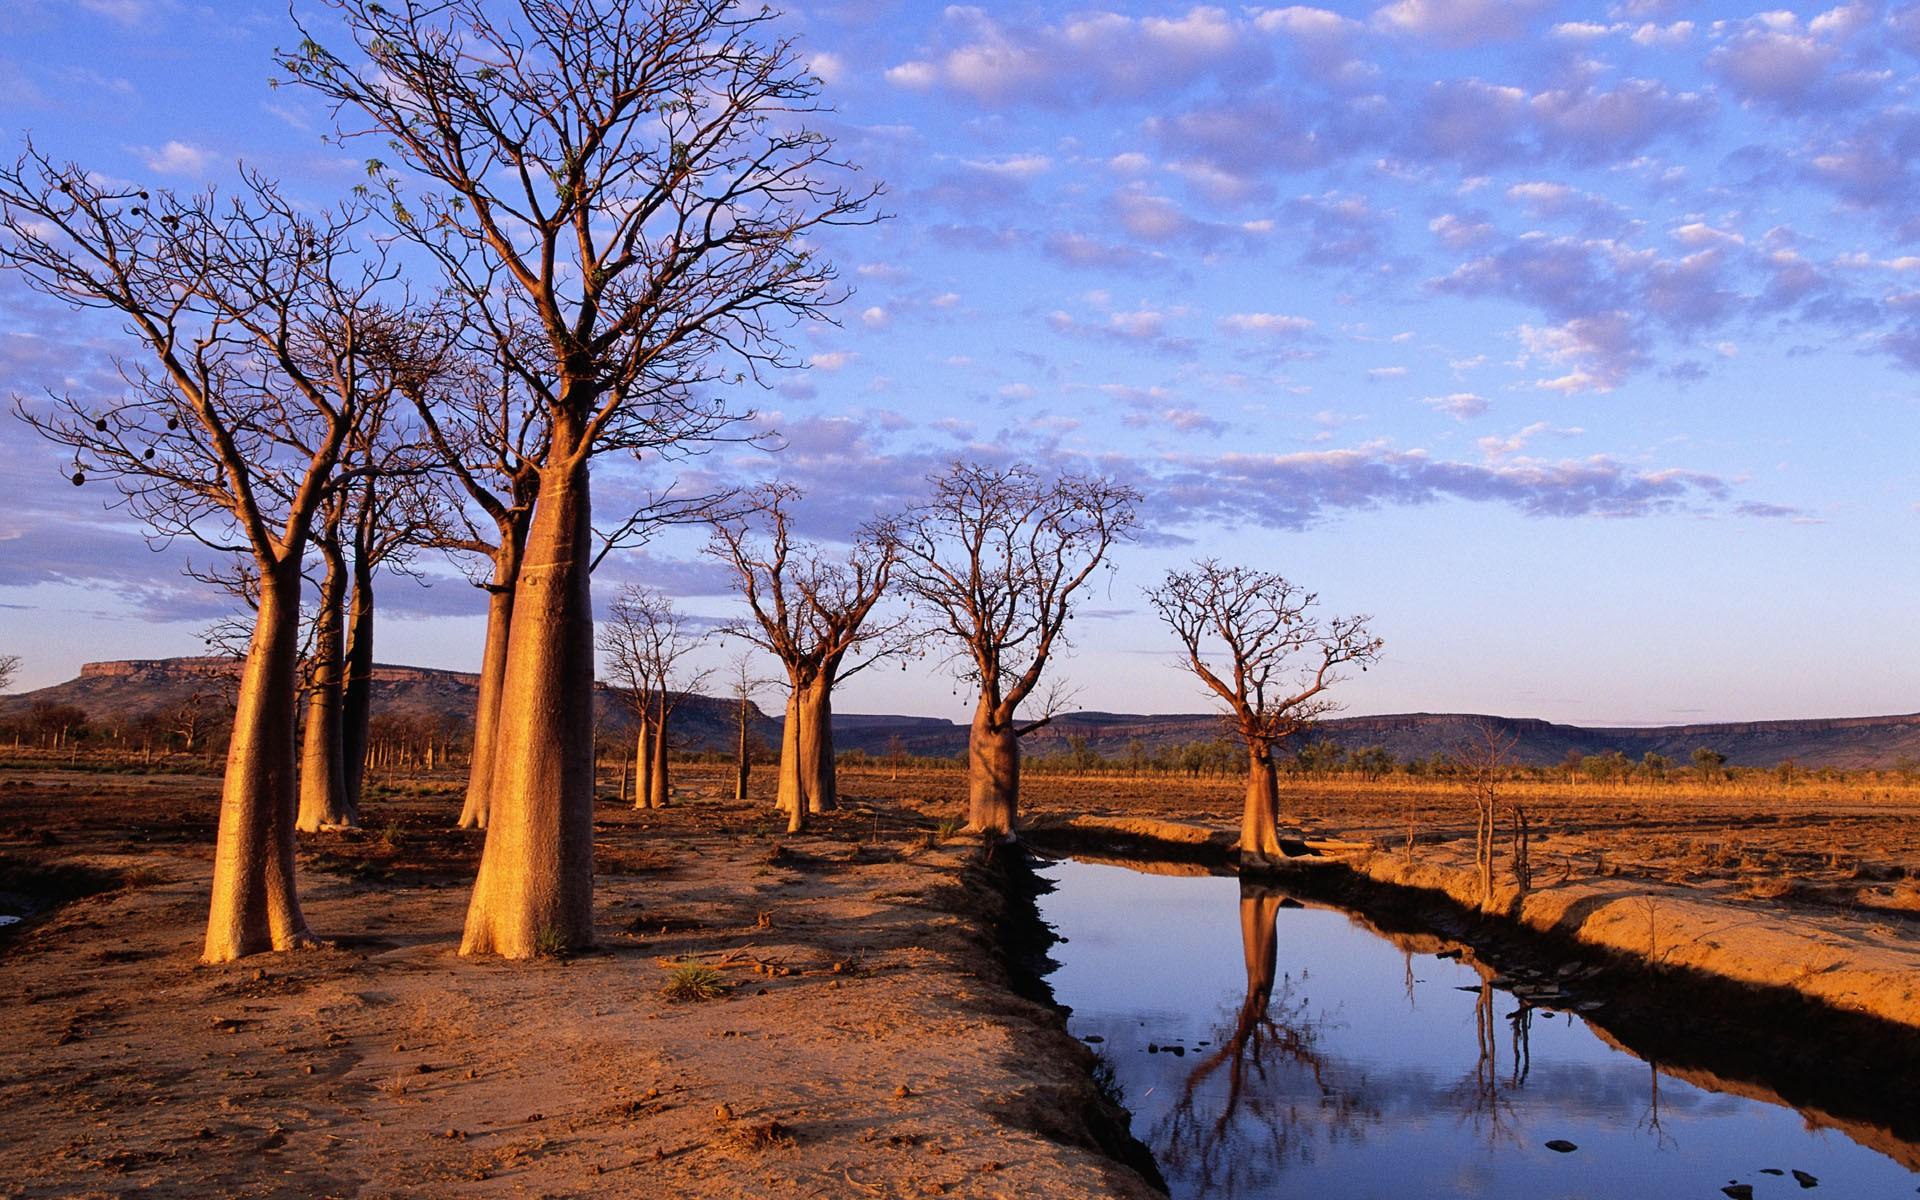 General 1920x1200 baobab trees baobabs trees desert sky landscape